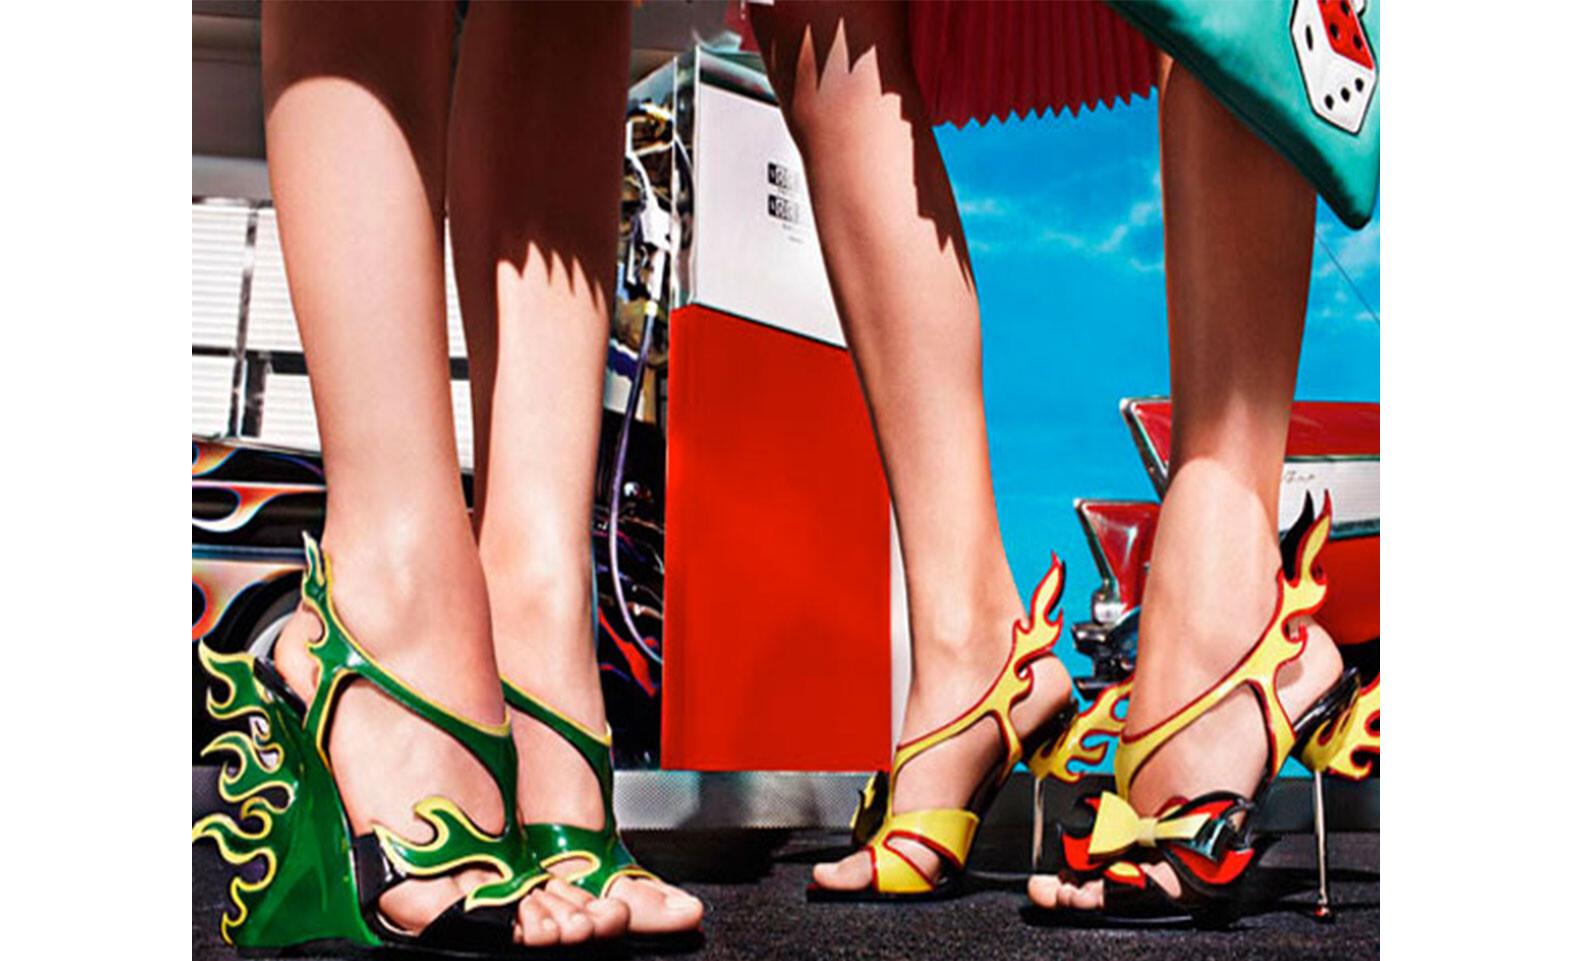 Prada Shoes 1 Wc Primary Image 2 Jpg